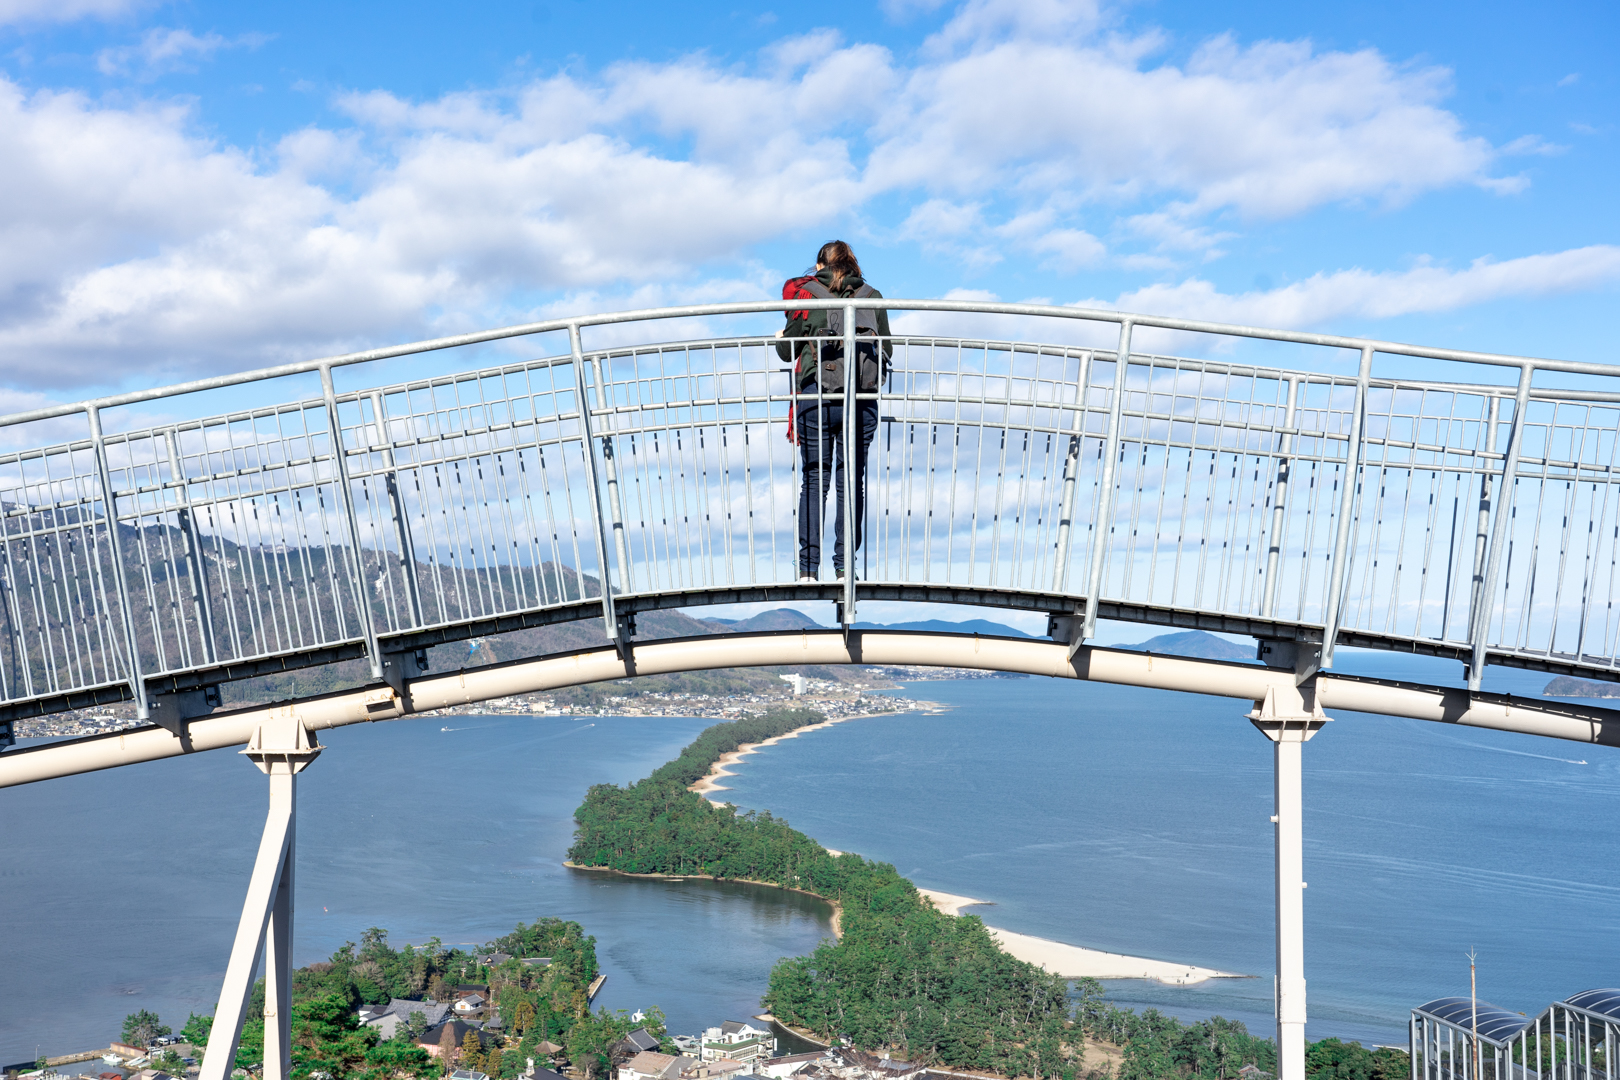 Author, Jessica Korteman, on bridge overlooking view of the Amanohashidate sandbar from Amanohashidate View Land.